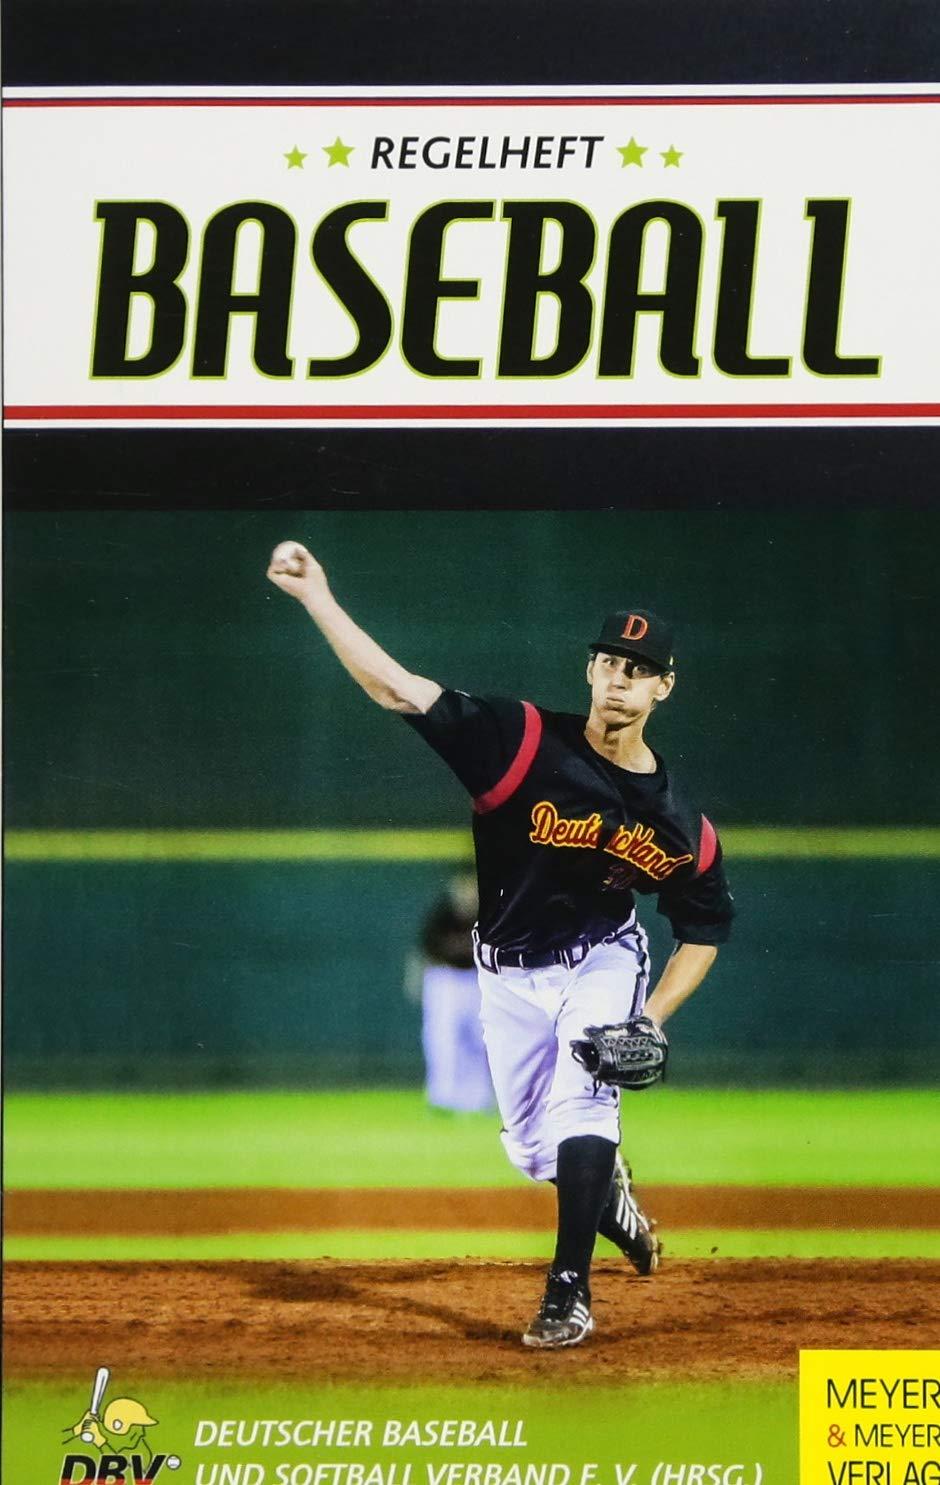 Regelheft Baseball  Das Offizielle Regelwerk Des Deutschen Baseball Und Softball